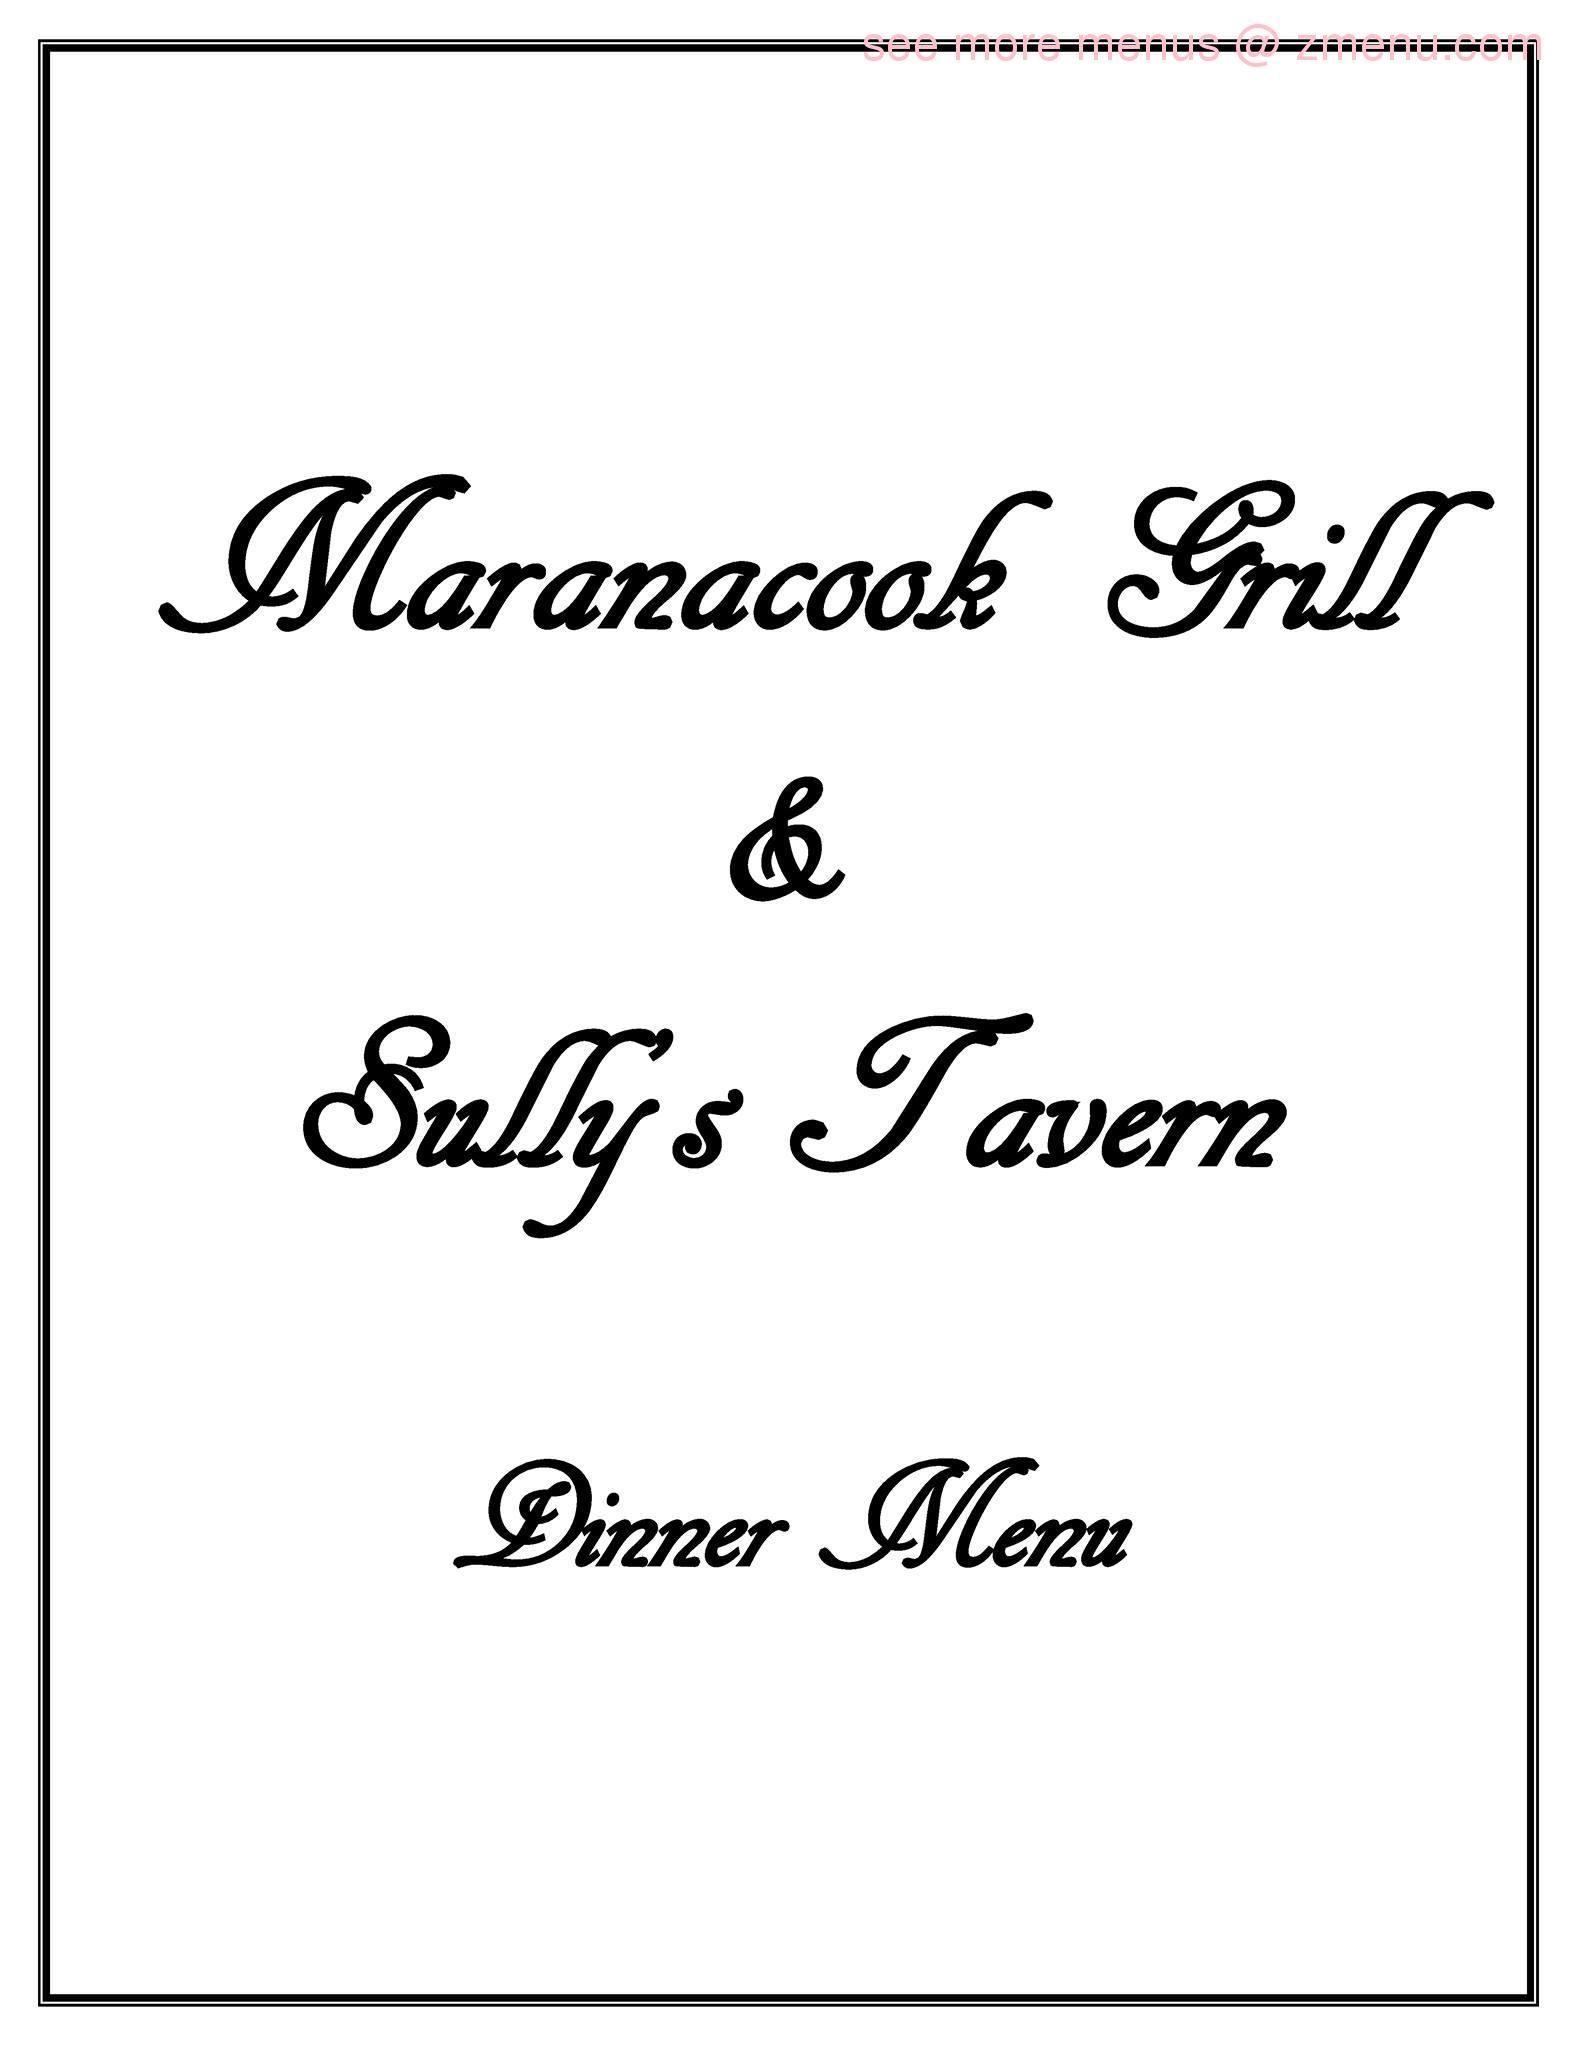 Online Menu of Sullys Tavern Restaurant, Winthrop, Maine